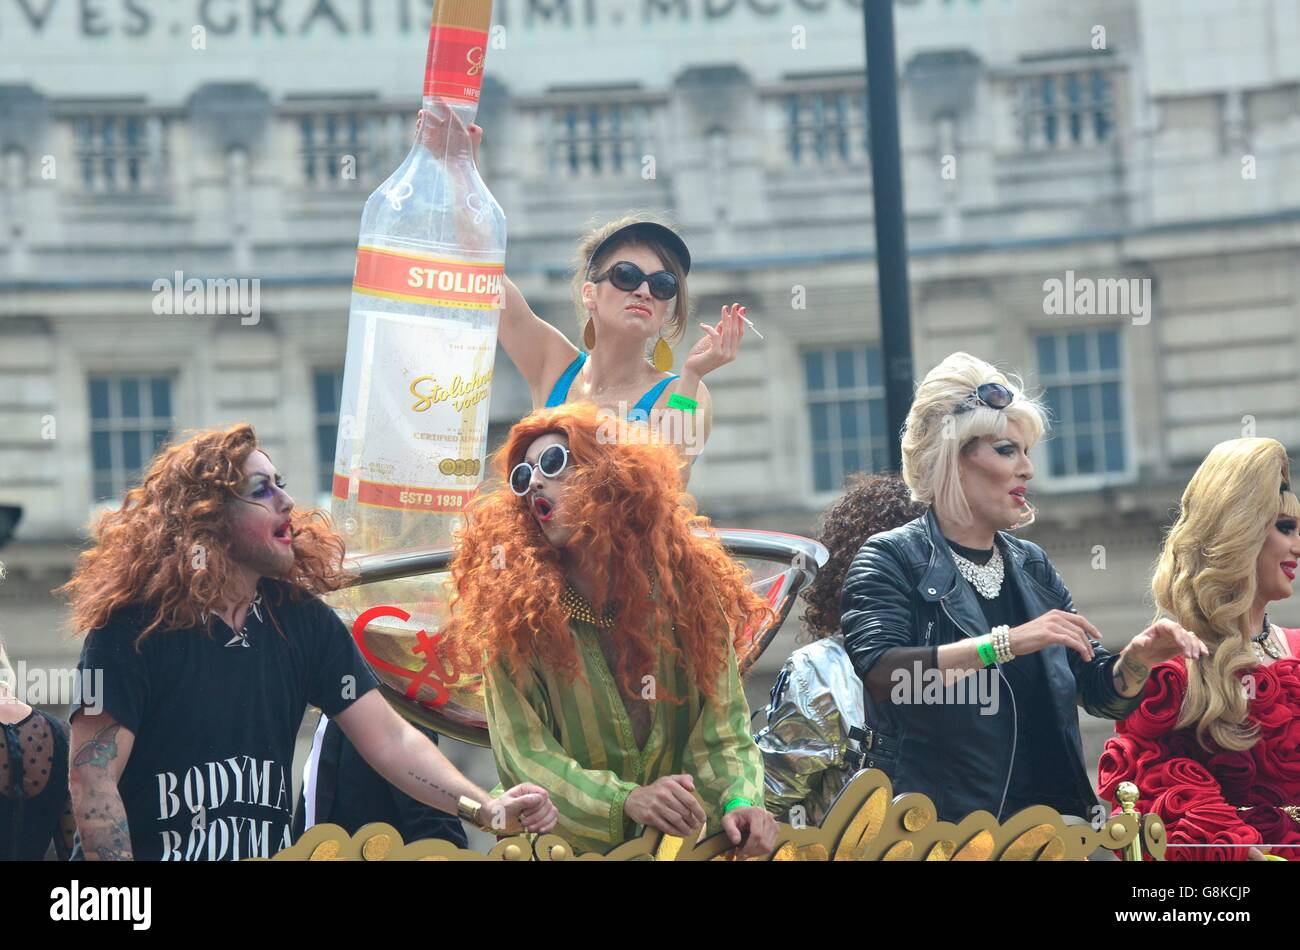 Gay Pride Parade 2016, London, England, UK Stock Photo